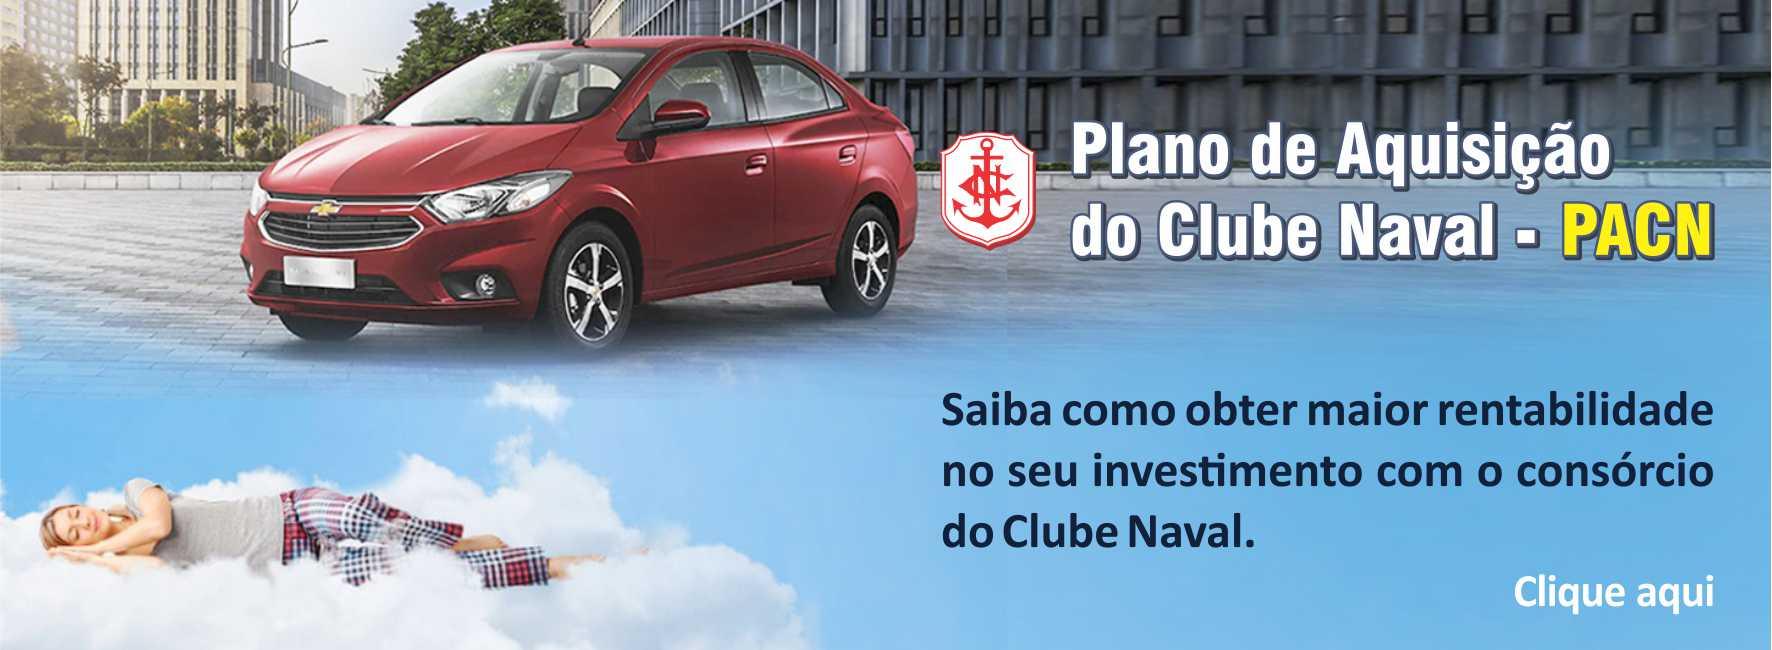 https://www.clubenaval.org.br/novo/?q=cons%C3%B3rcio-pacn